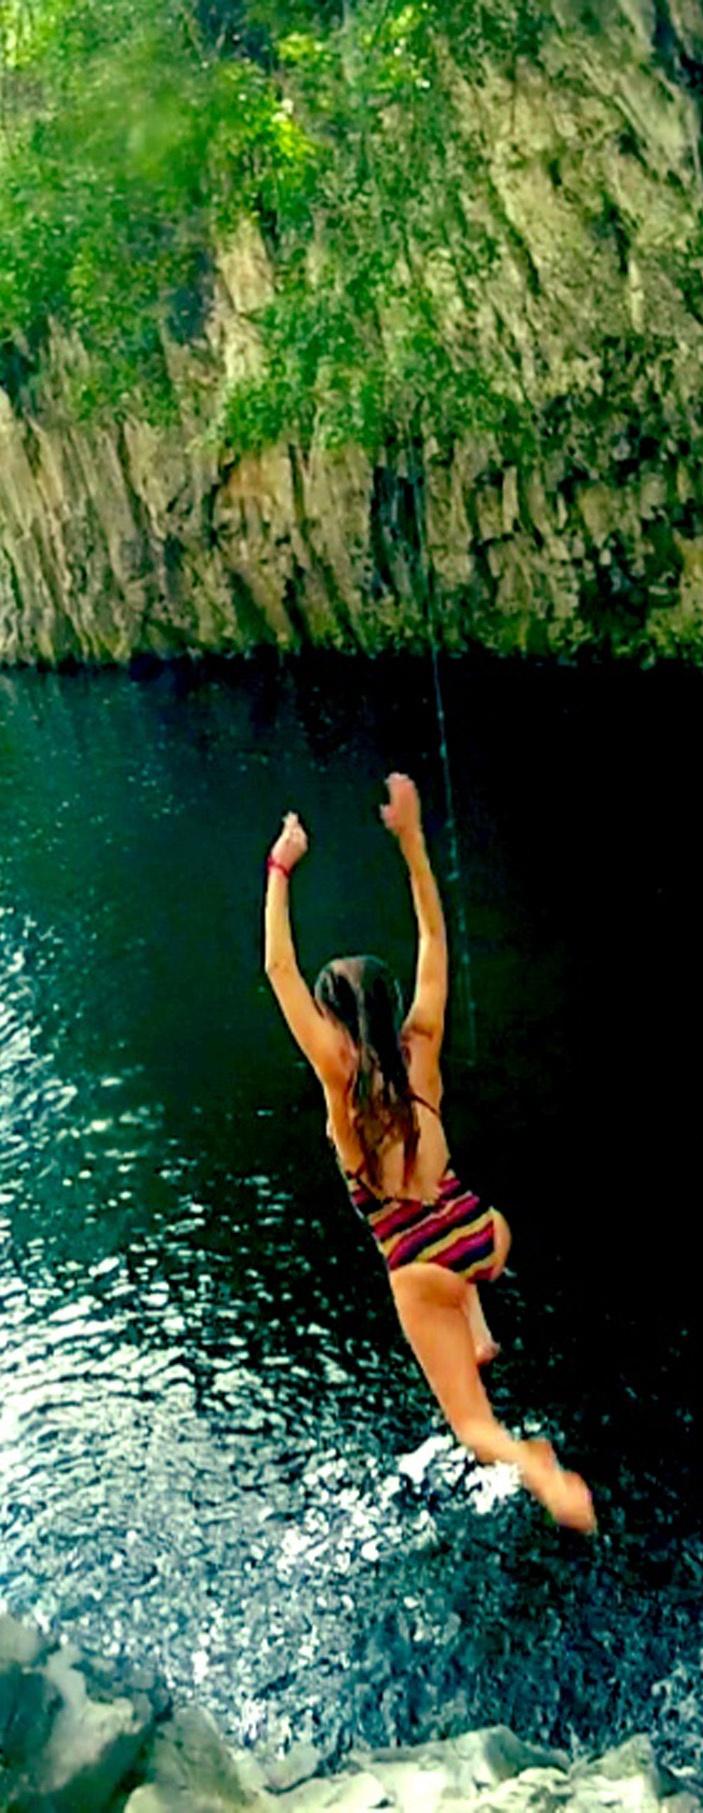 Monyca Byrne Wickey taking a leap in her Lapped Swimsuit shot on her @GoPro #ROXYOutdoorFitness